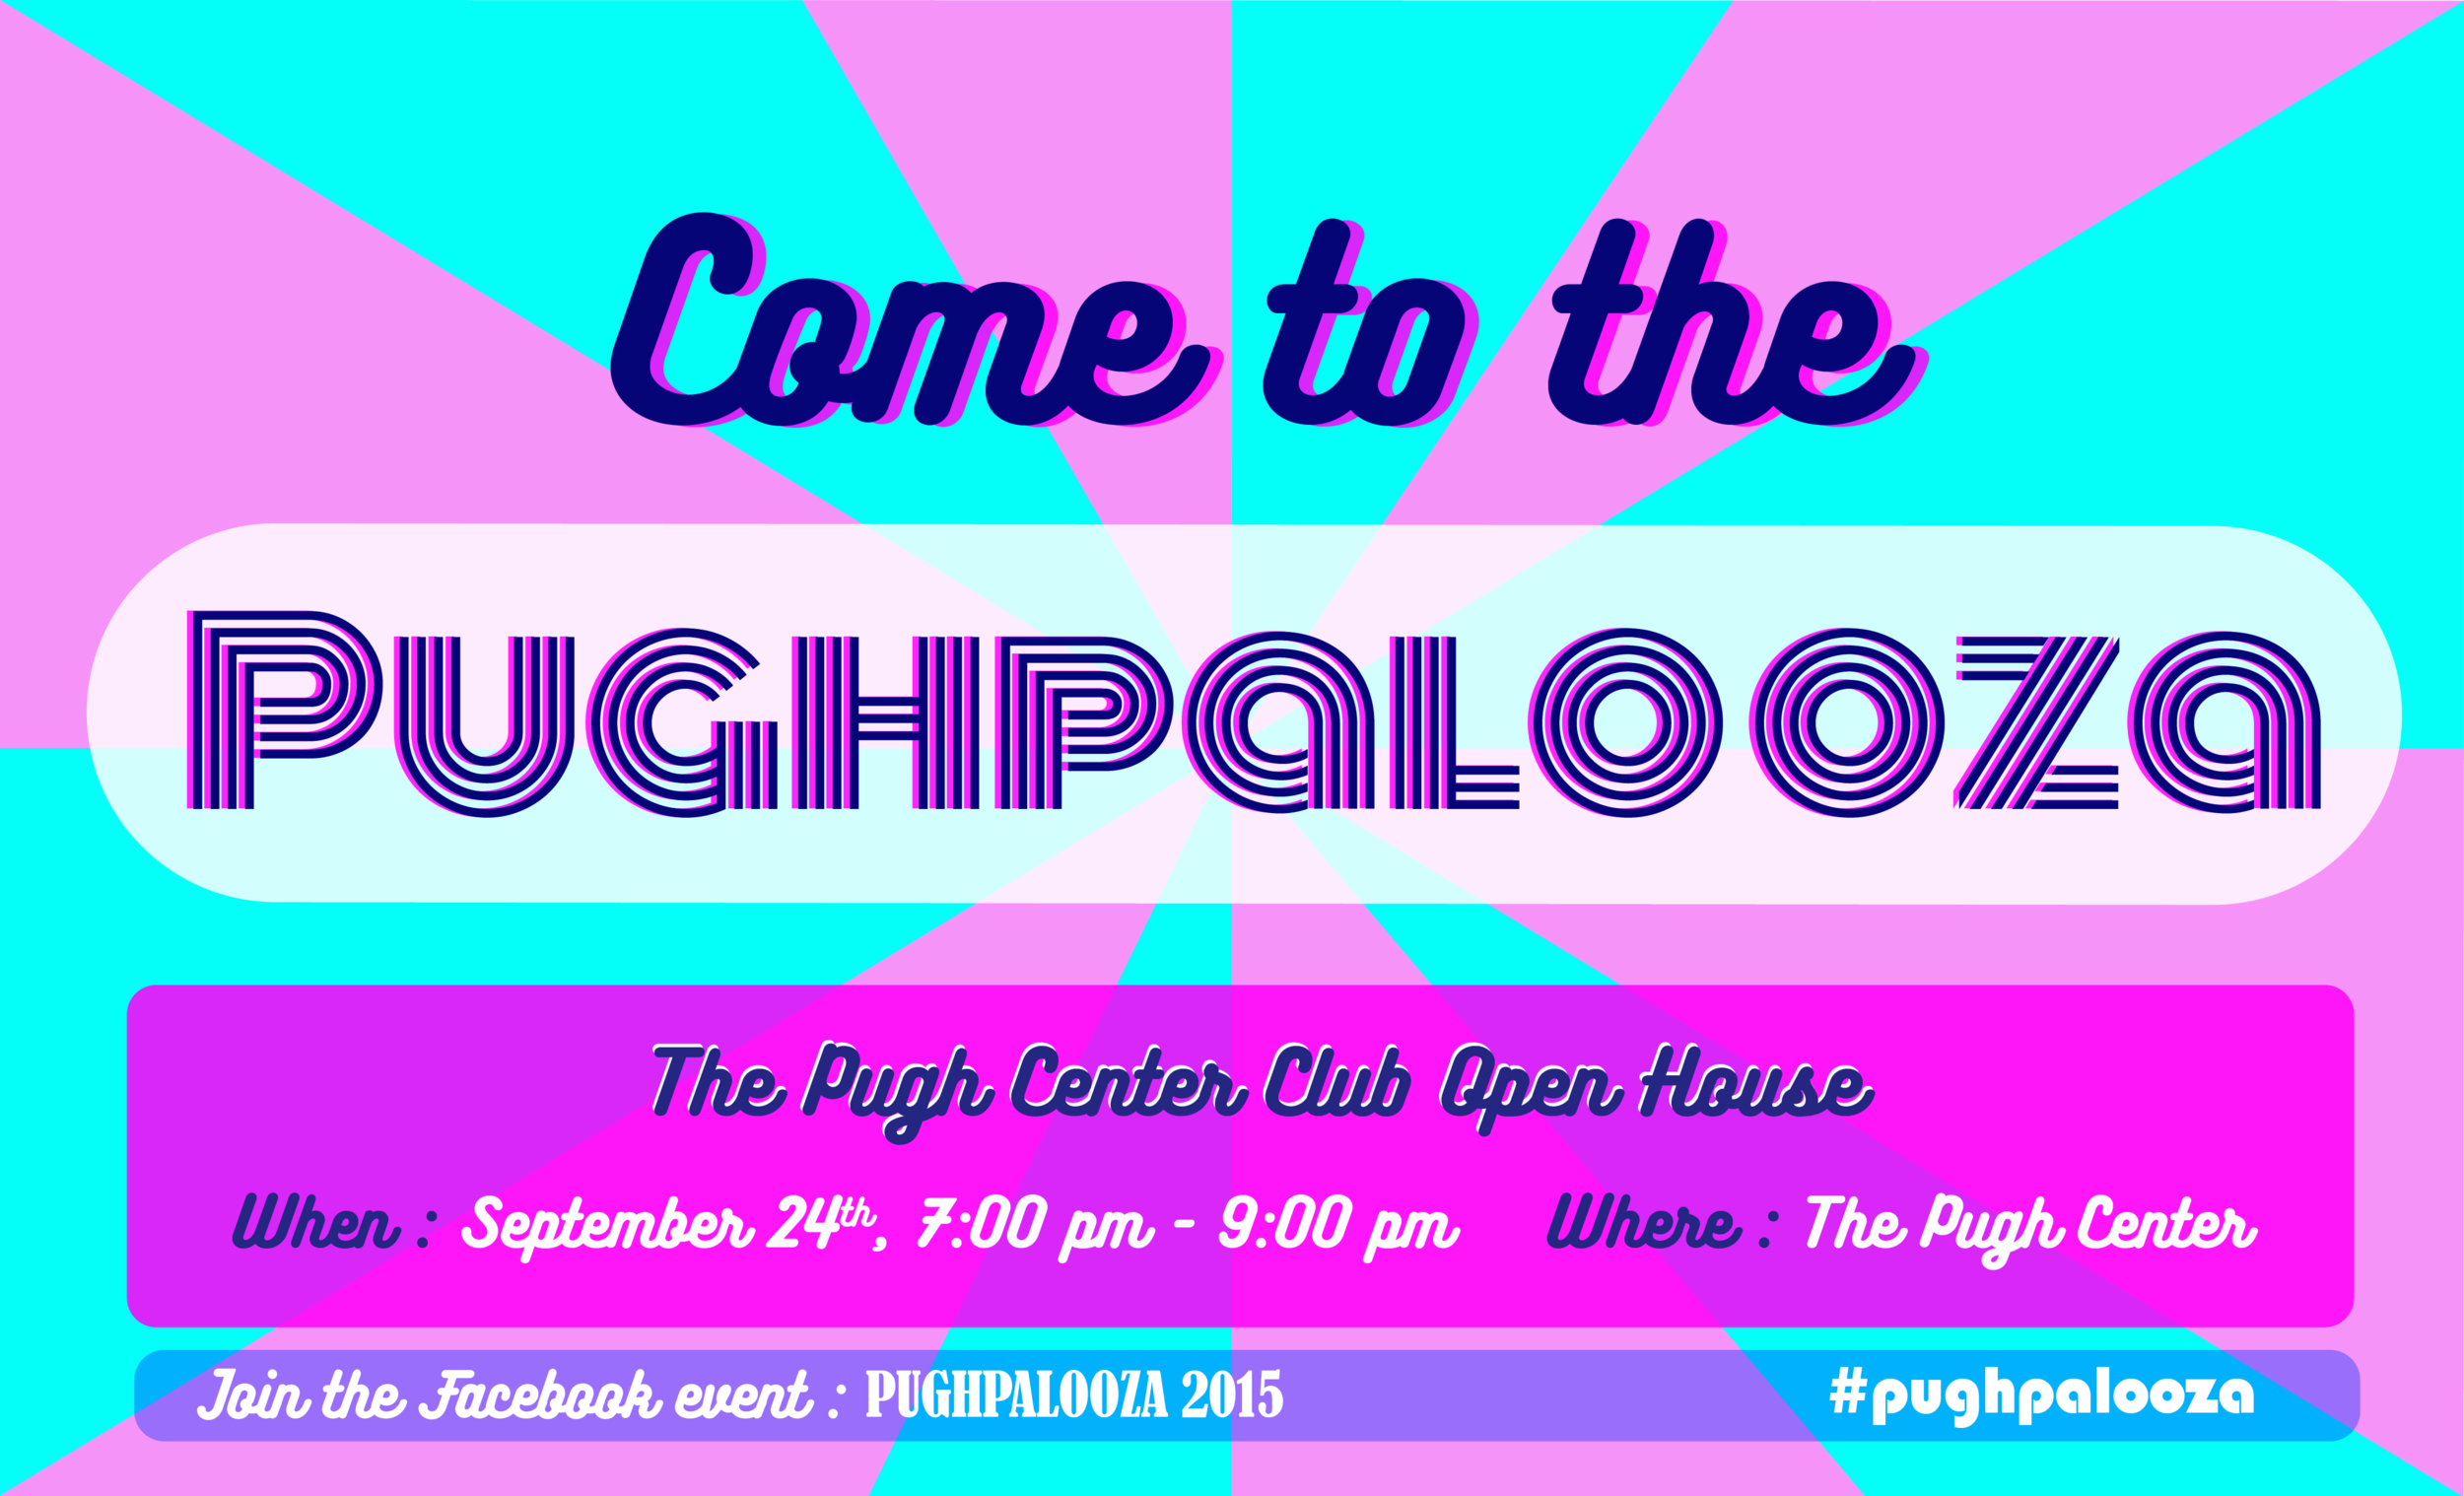 pughpalooza-03 copy.png